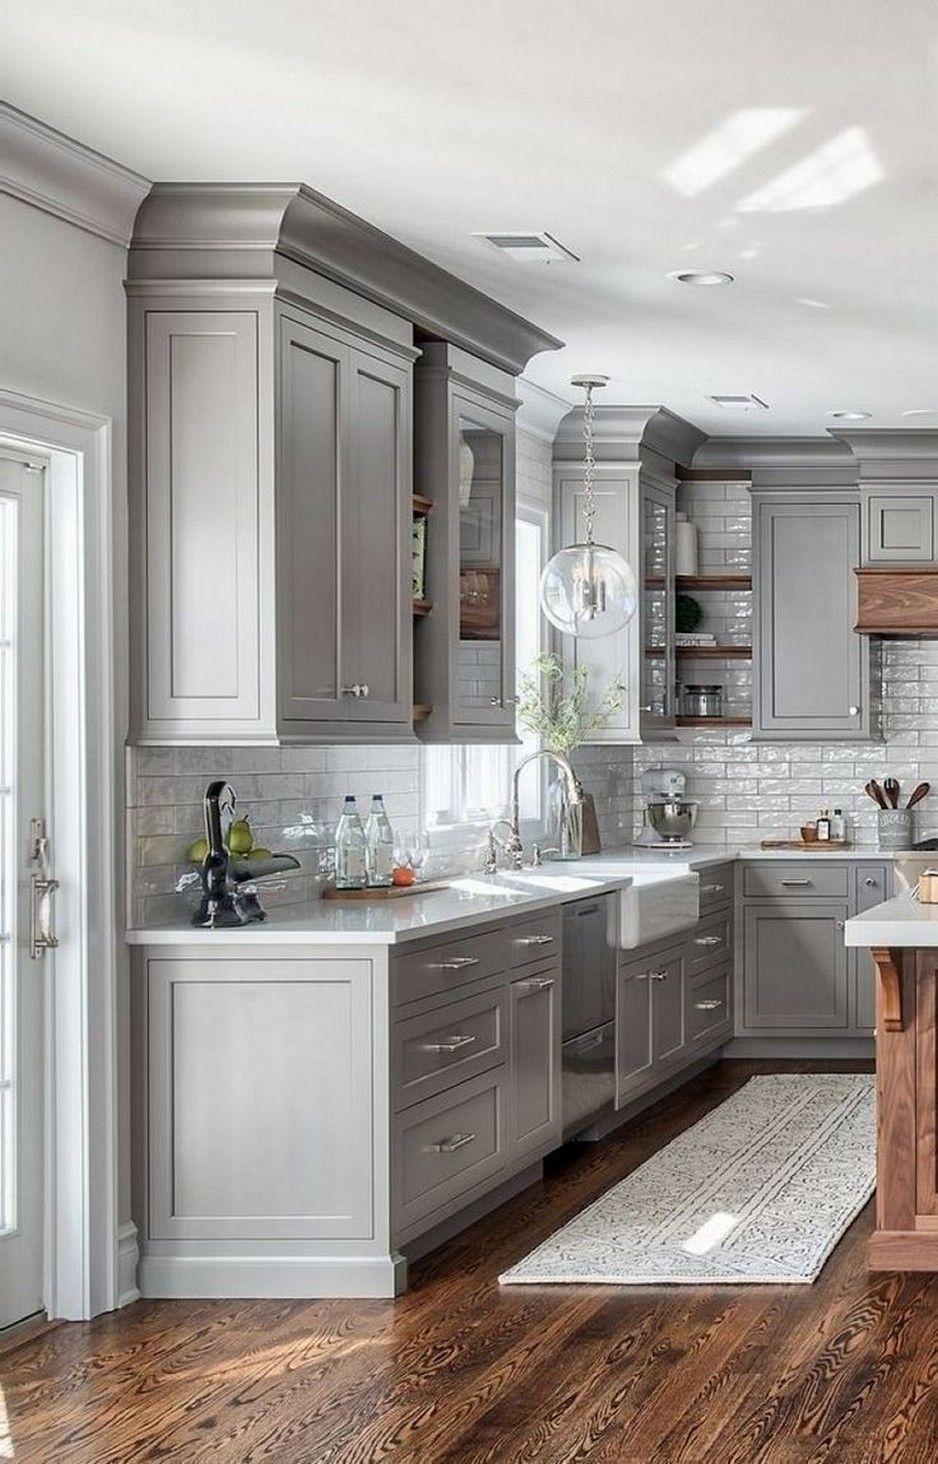 55 Dream Kitchens That Will Leave You Breathless 46 In 2020 Kitchen Cabinets Decor Classy Kitchen Modern Kitchen Design